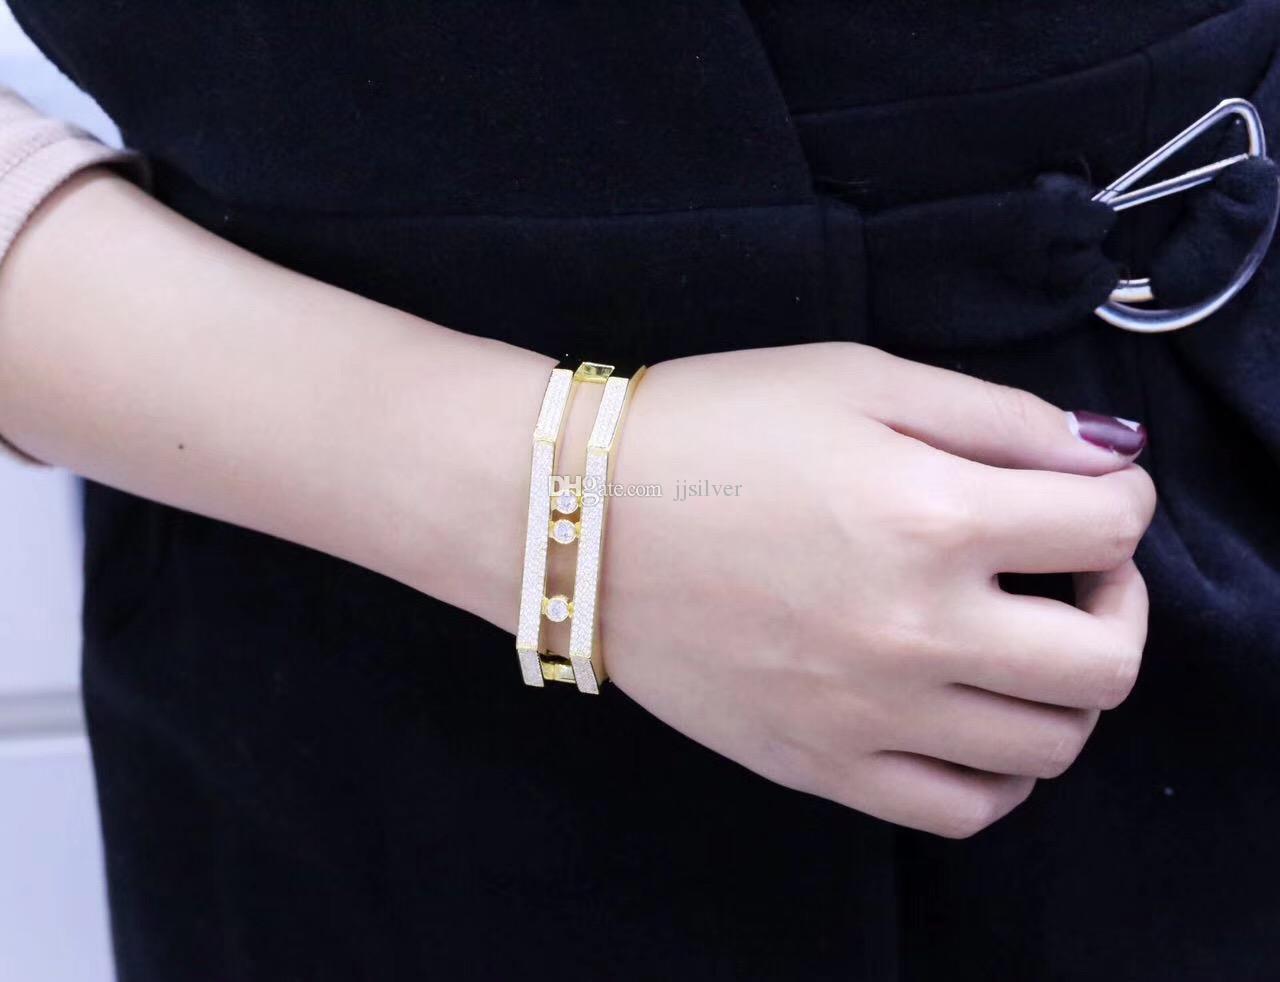 Luxury Zircon 925 Sterling Silver Running Stone Bangle white gold Plated Women Created Bridal Wedding Jewelry